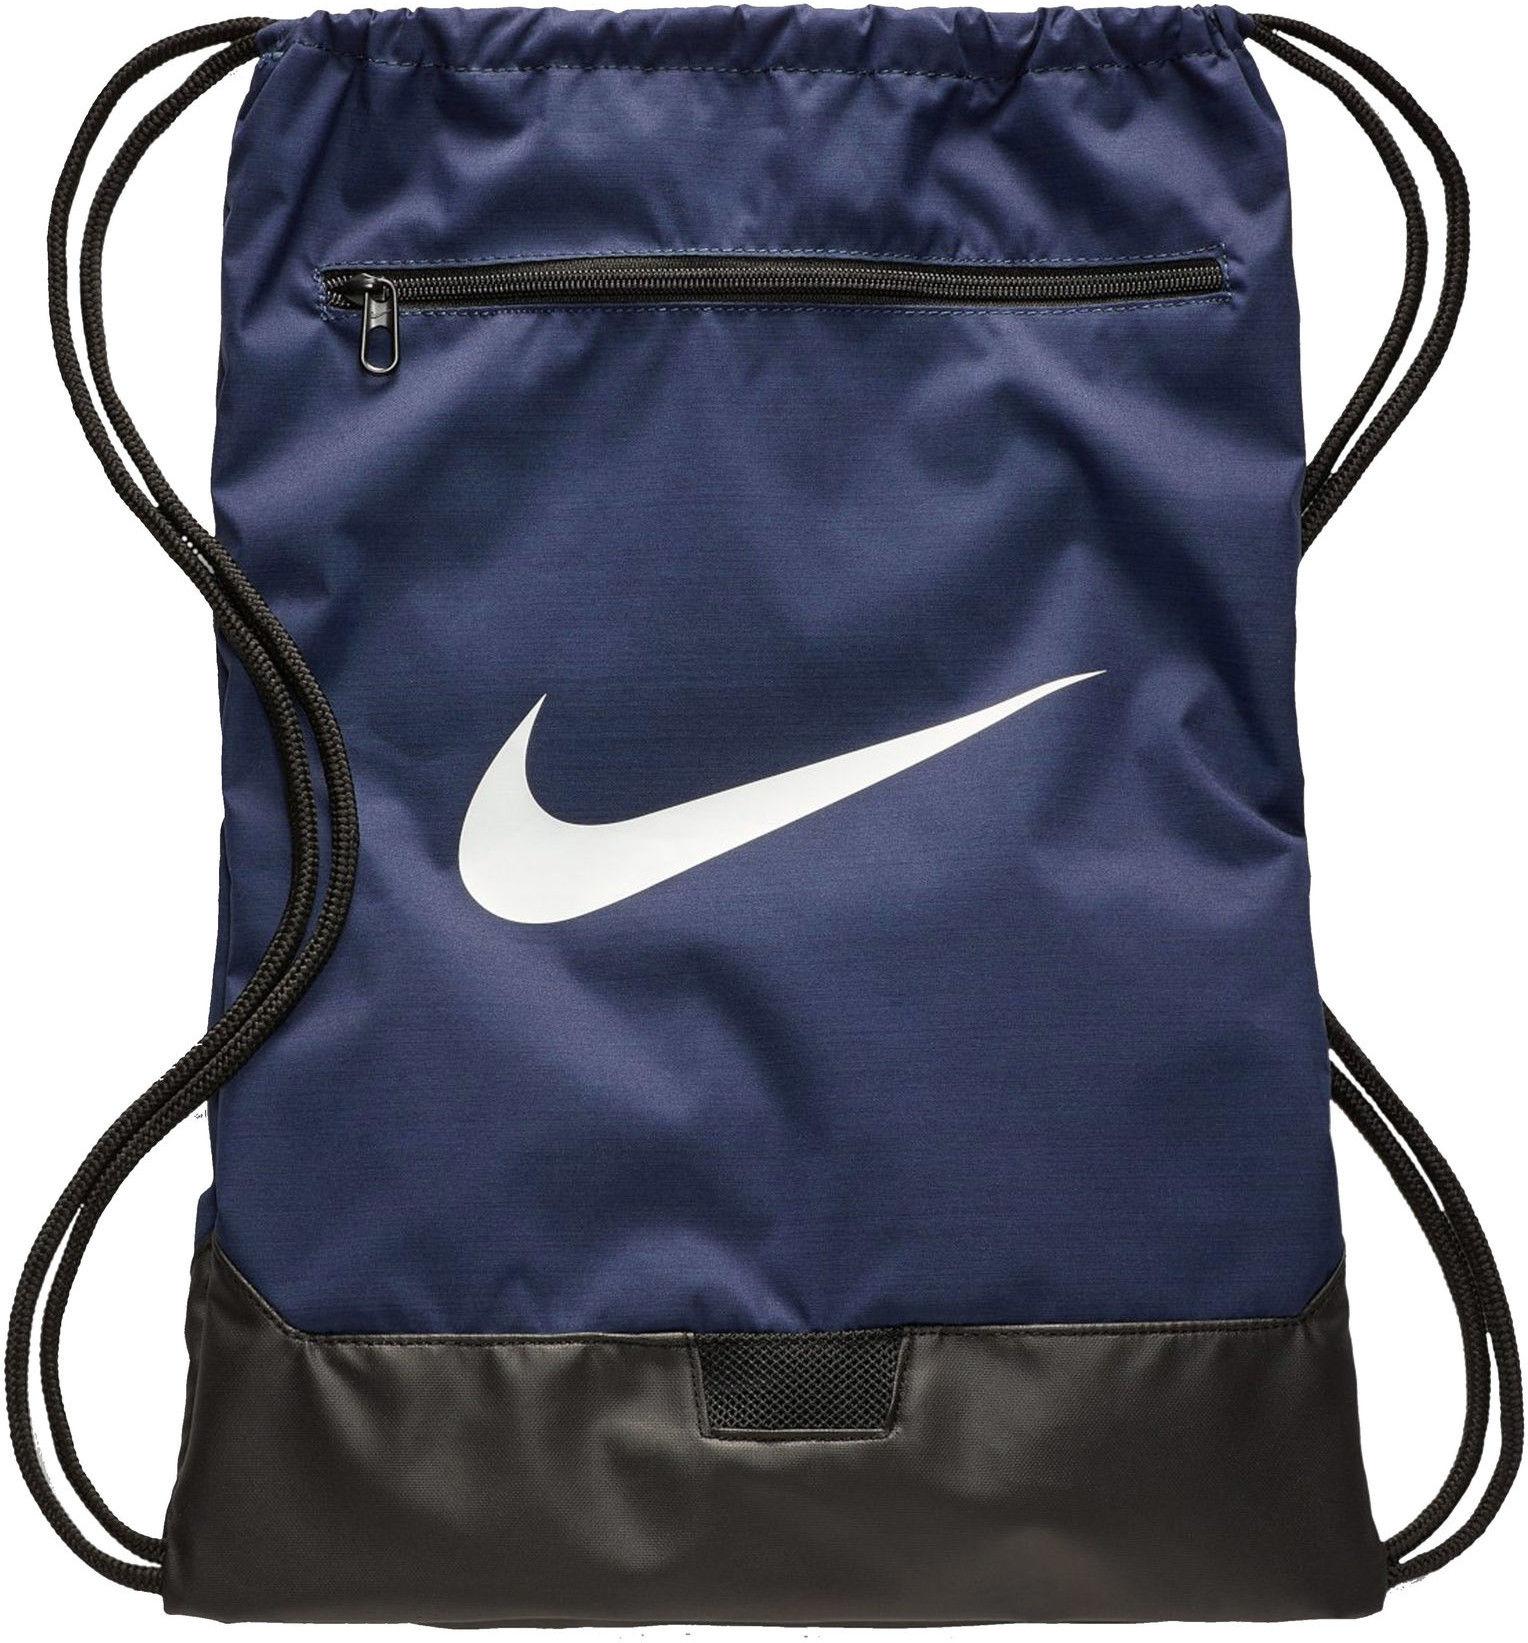 Worek na buty Nike Brasilia 9.0 BA5953 410 granatowy